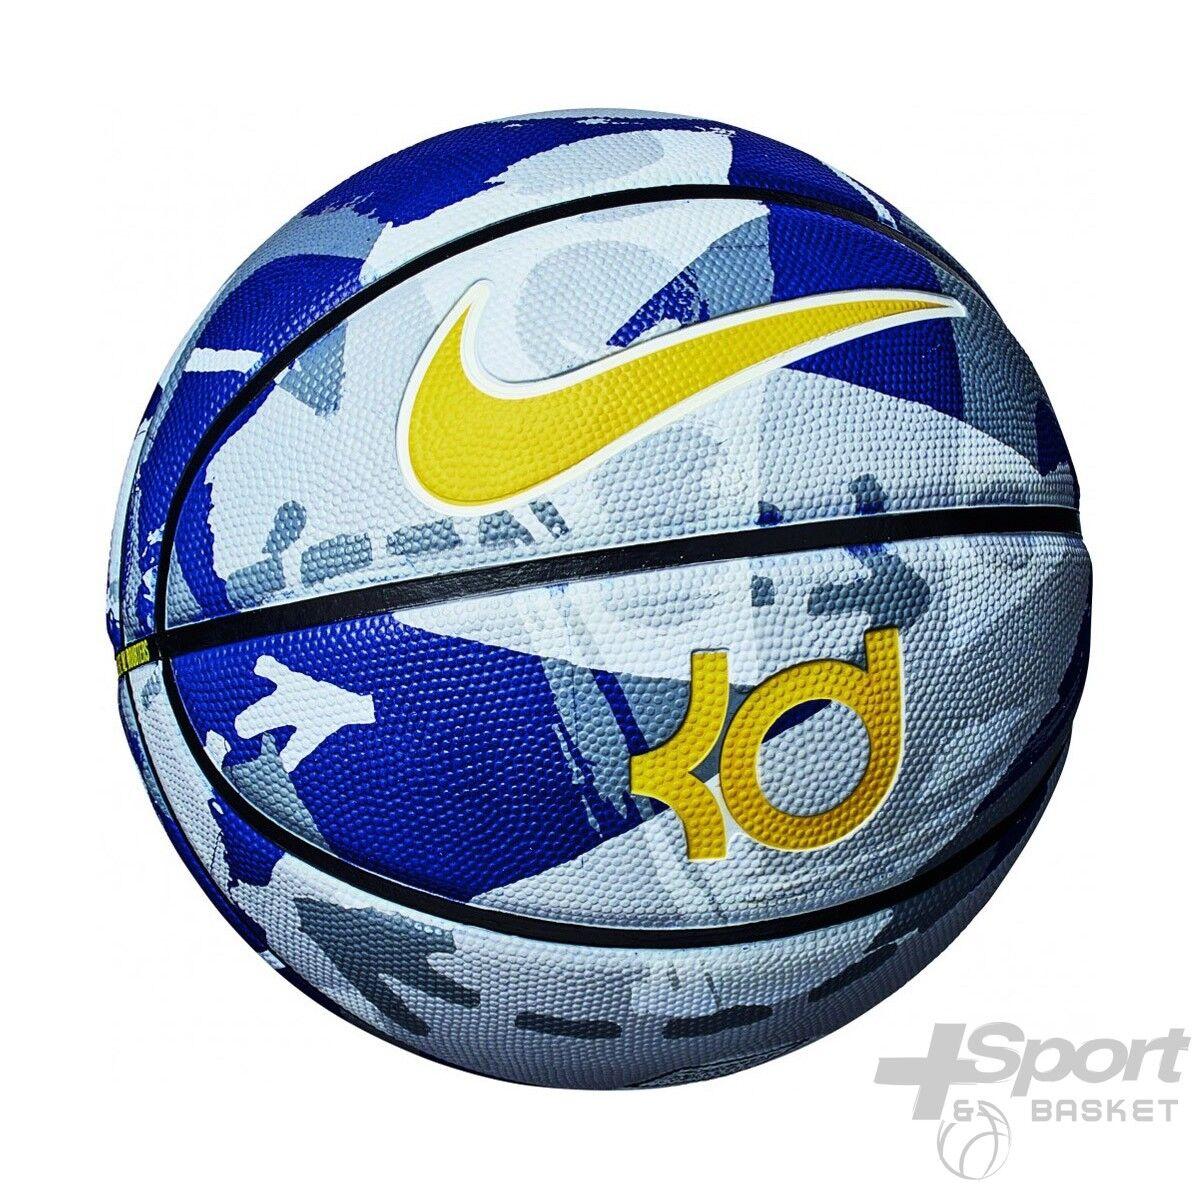 Ball Ball Ball Basketball NIKE KEVIN DURANT Spielplatz Größe 7 - NKI1398707 828c7b